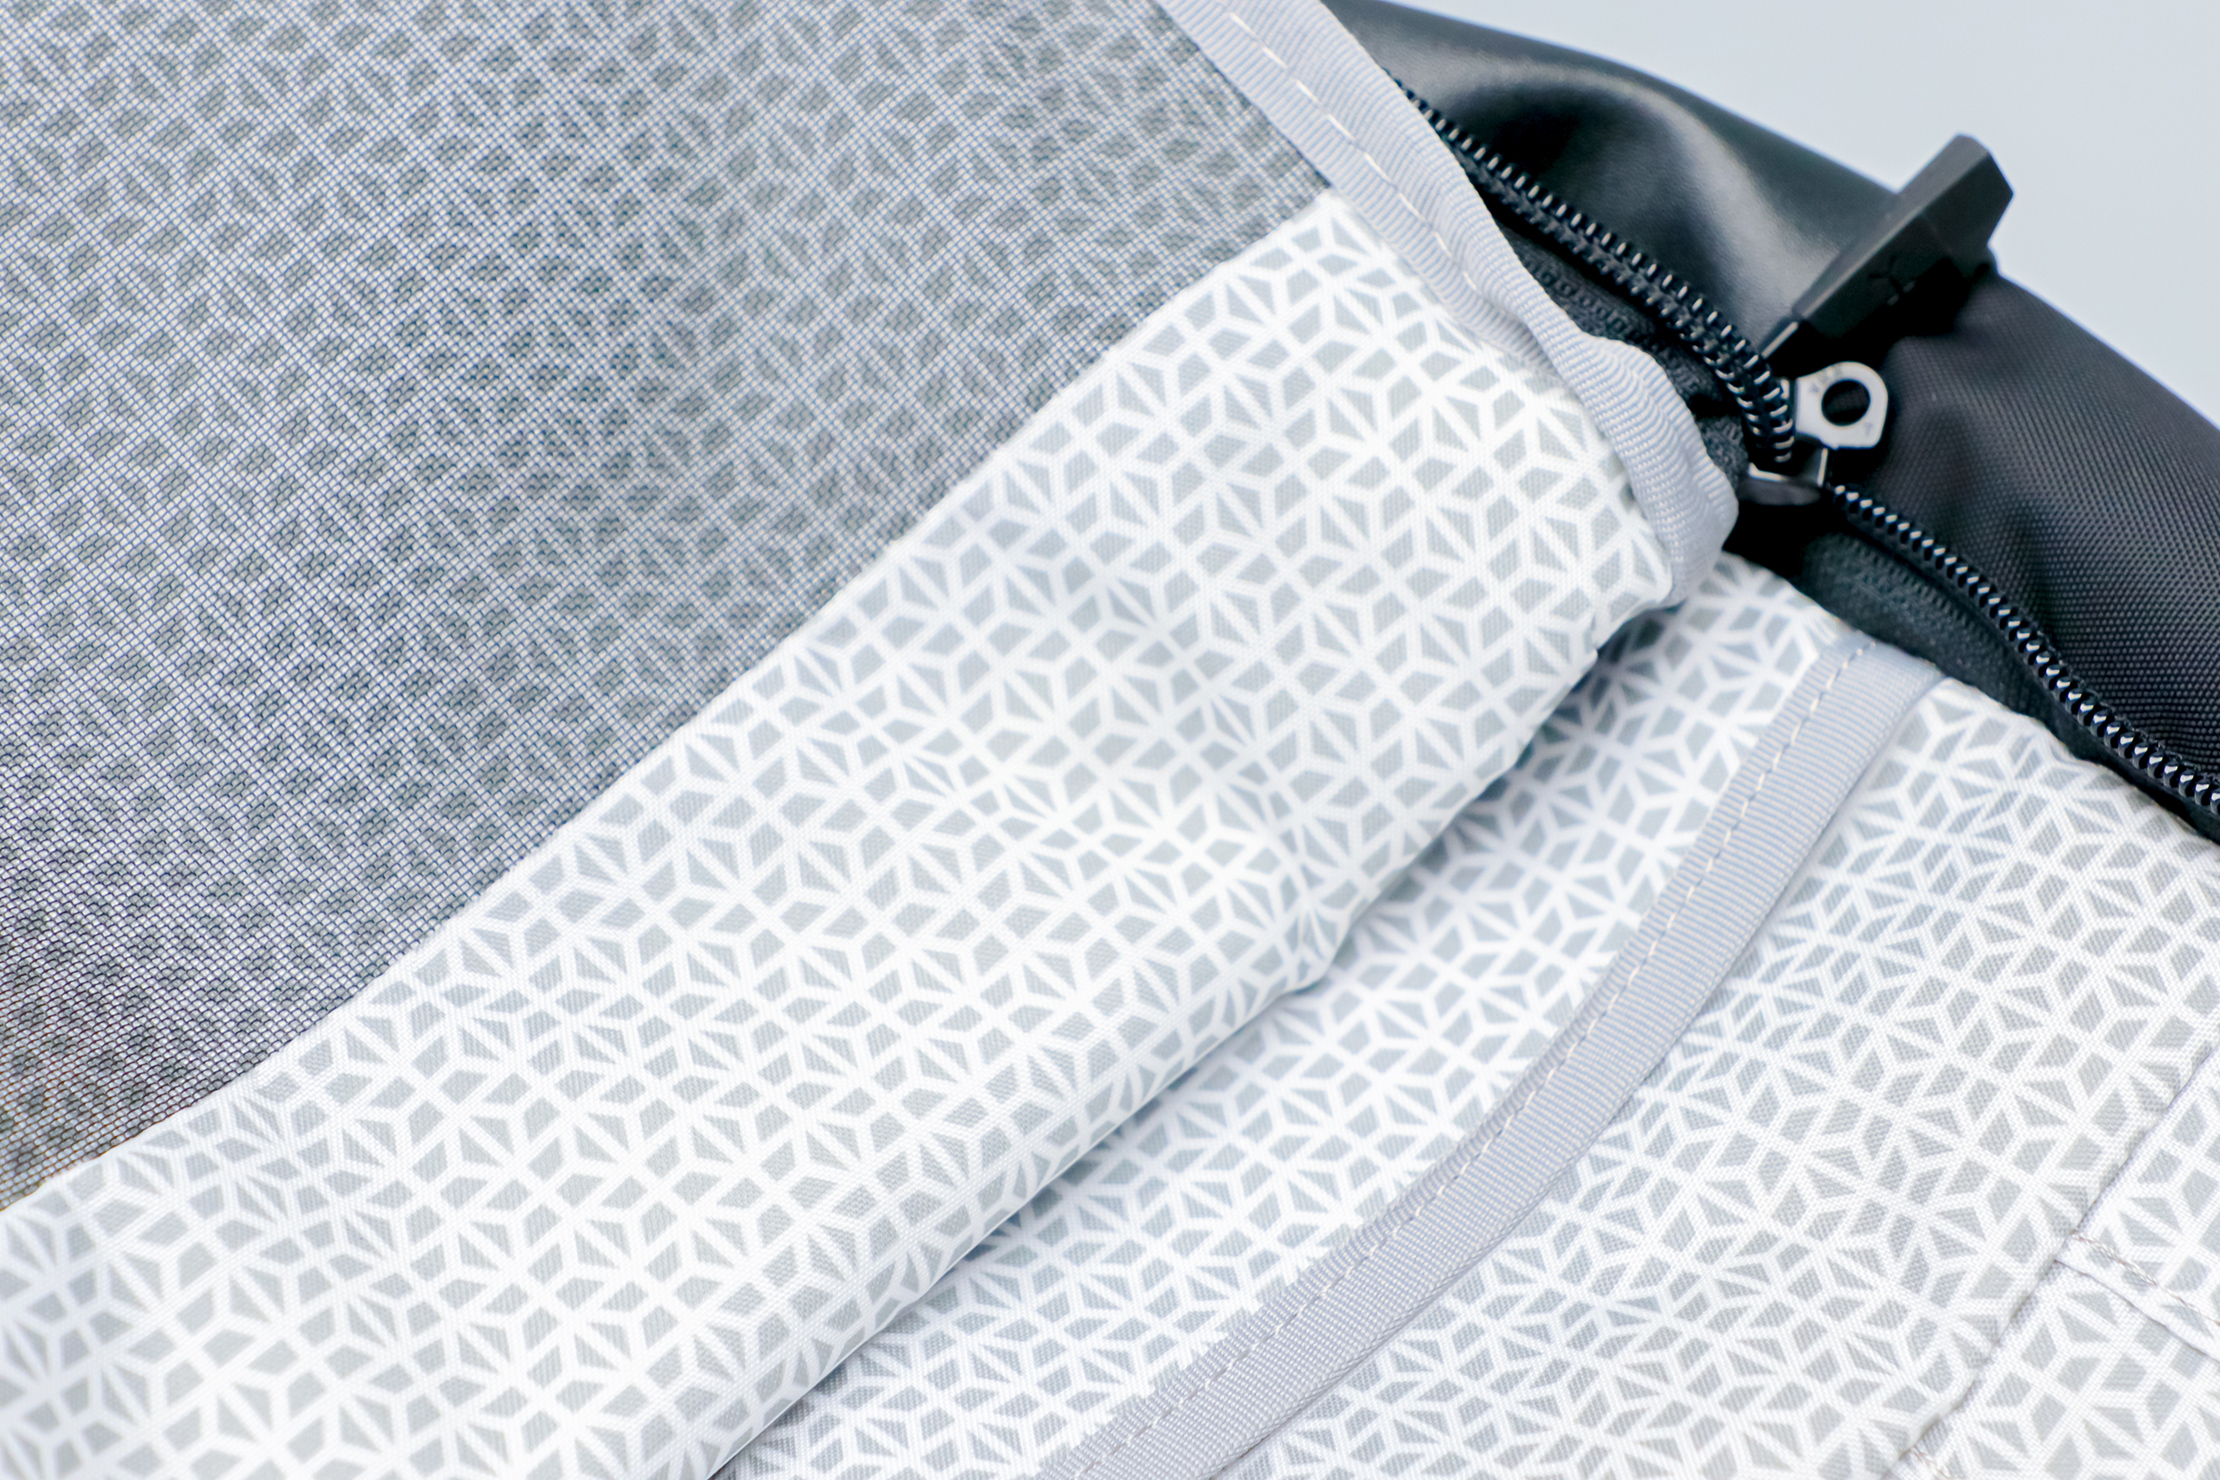 Knack Medium Expandable Pack Series 2 interior liner